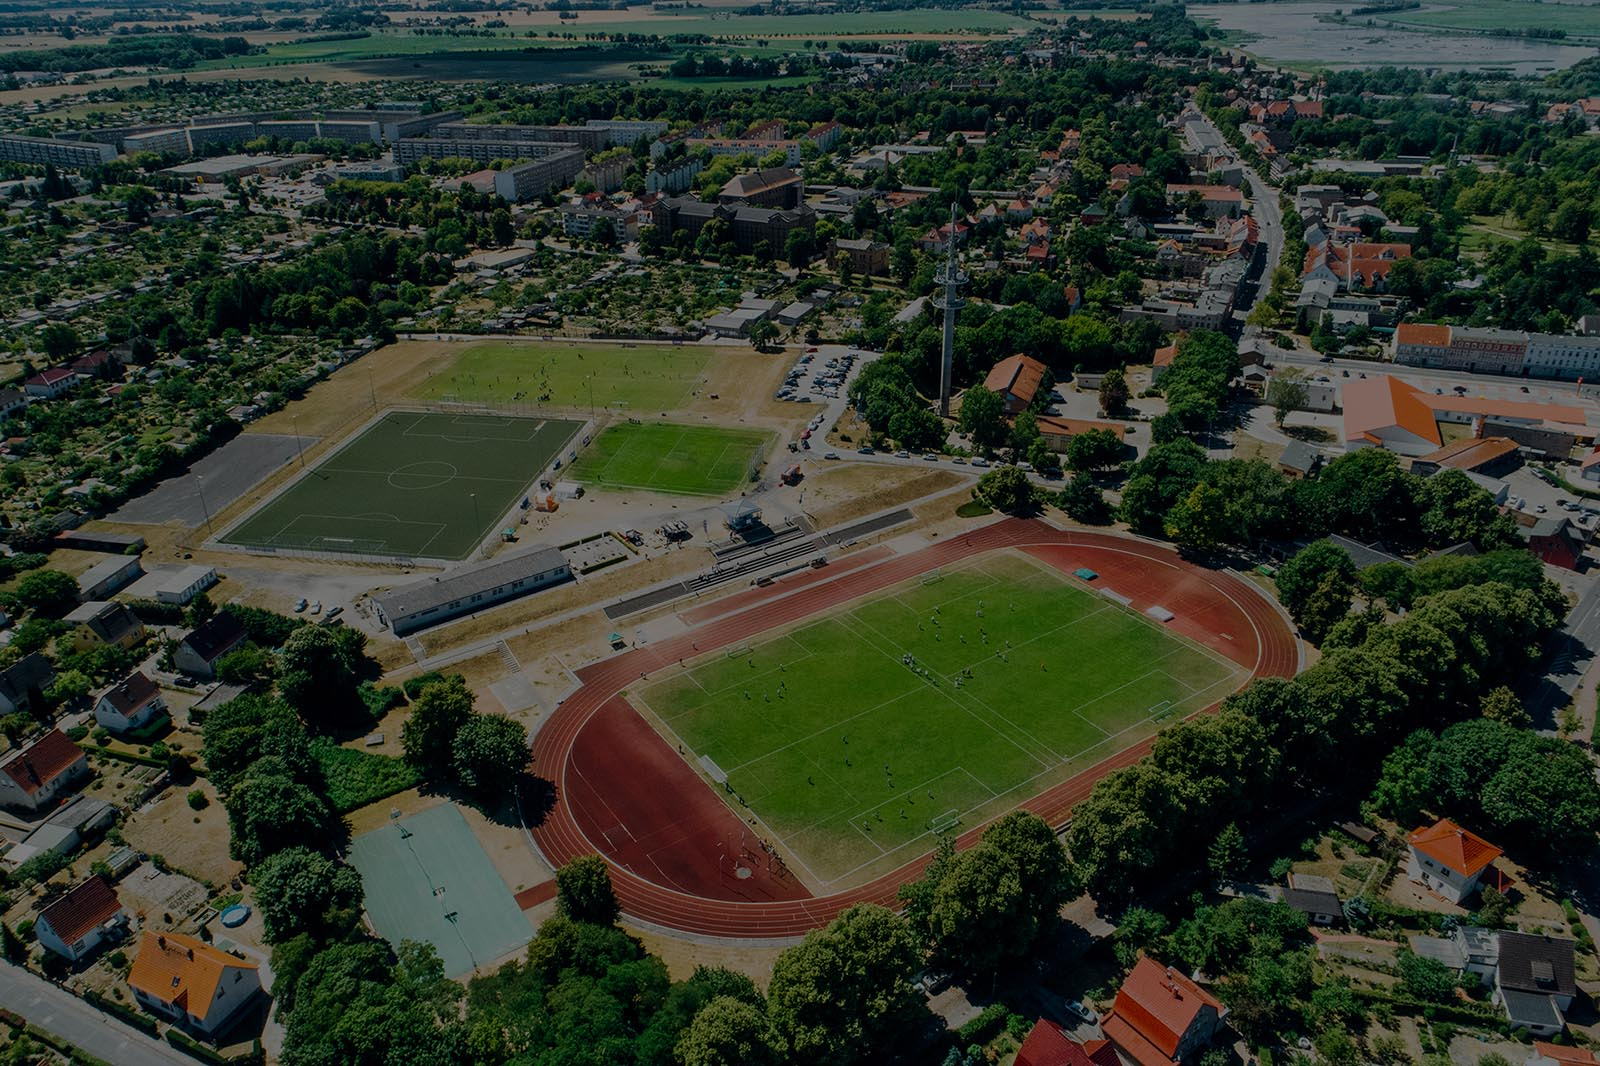 Landespokal: C-Junioren lassen gegen Waren nichts anbrennen